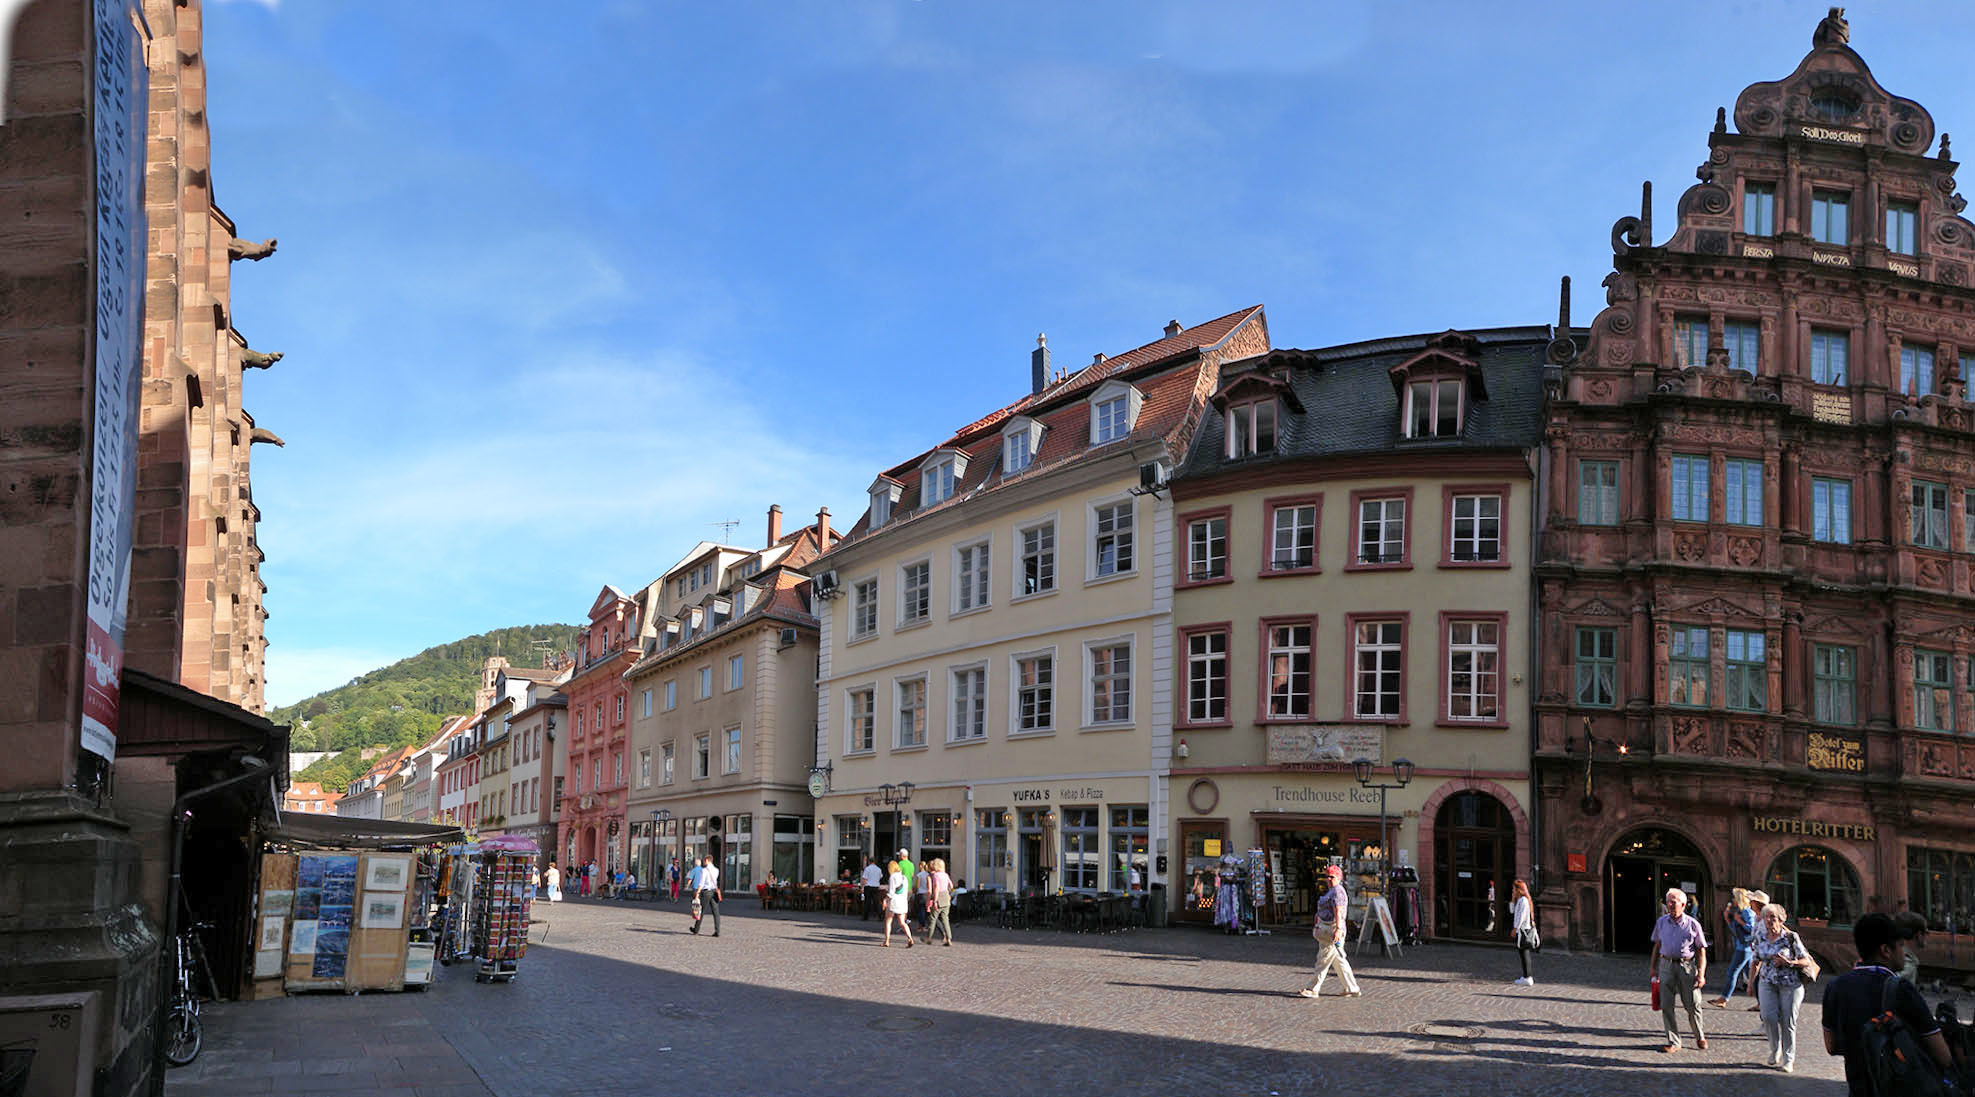 The Hauptstrasse, Heiidelberg Photograph by David Hill, taken 26 August 2015, 15.27, GMT